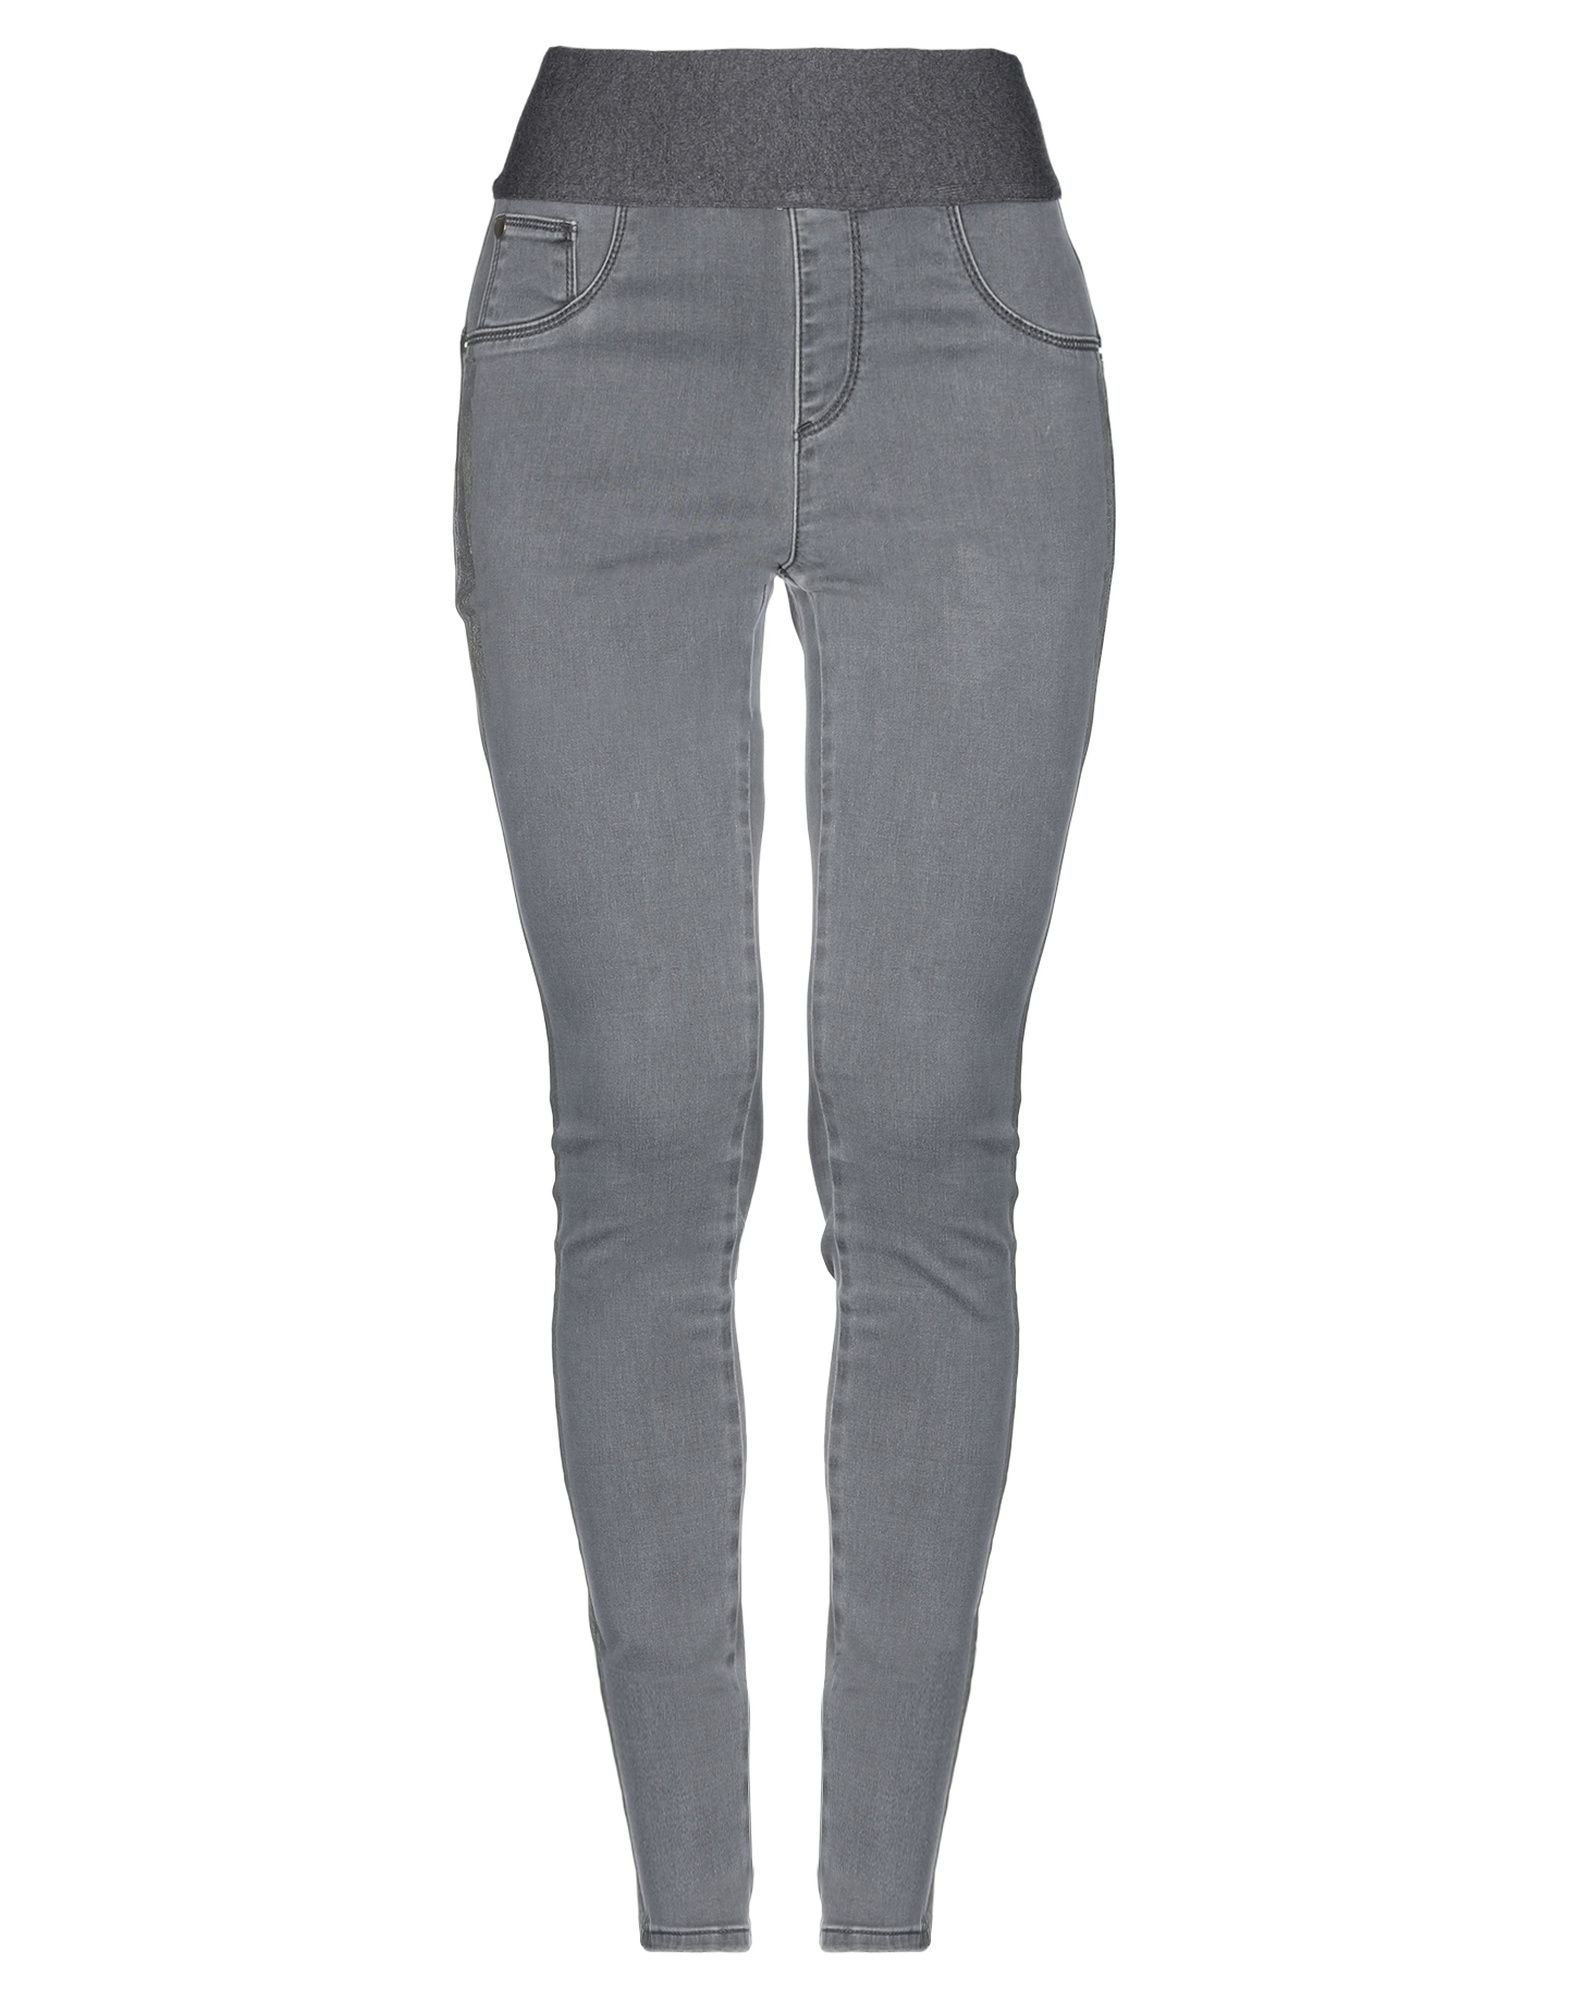 MARANI JEANS Джинсовые брюки marani jeans джинсовые брюки